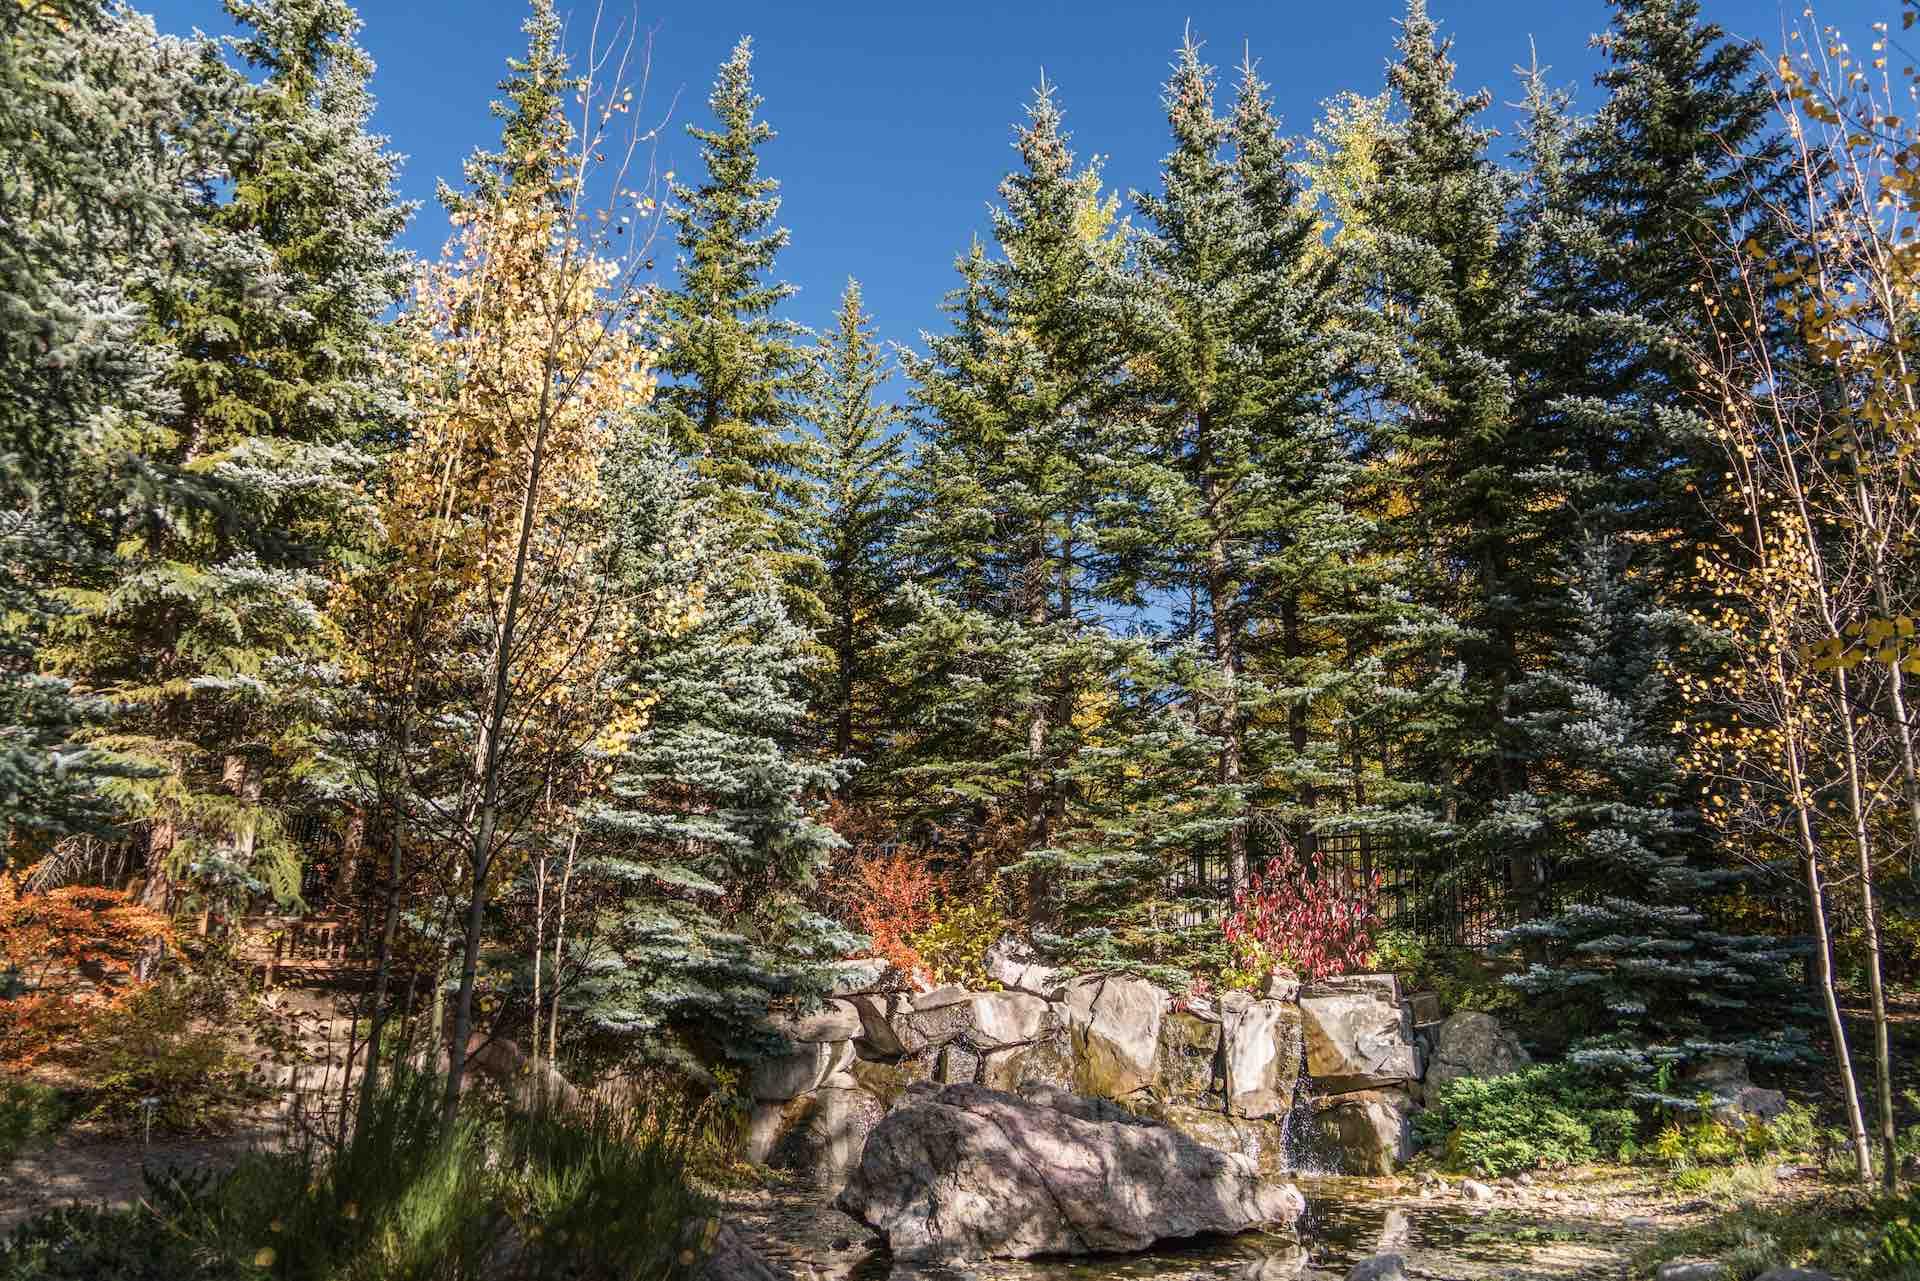 4 Pillars Functional Medicine – Vail Colorado Mountains